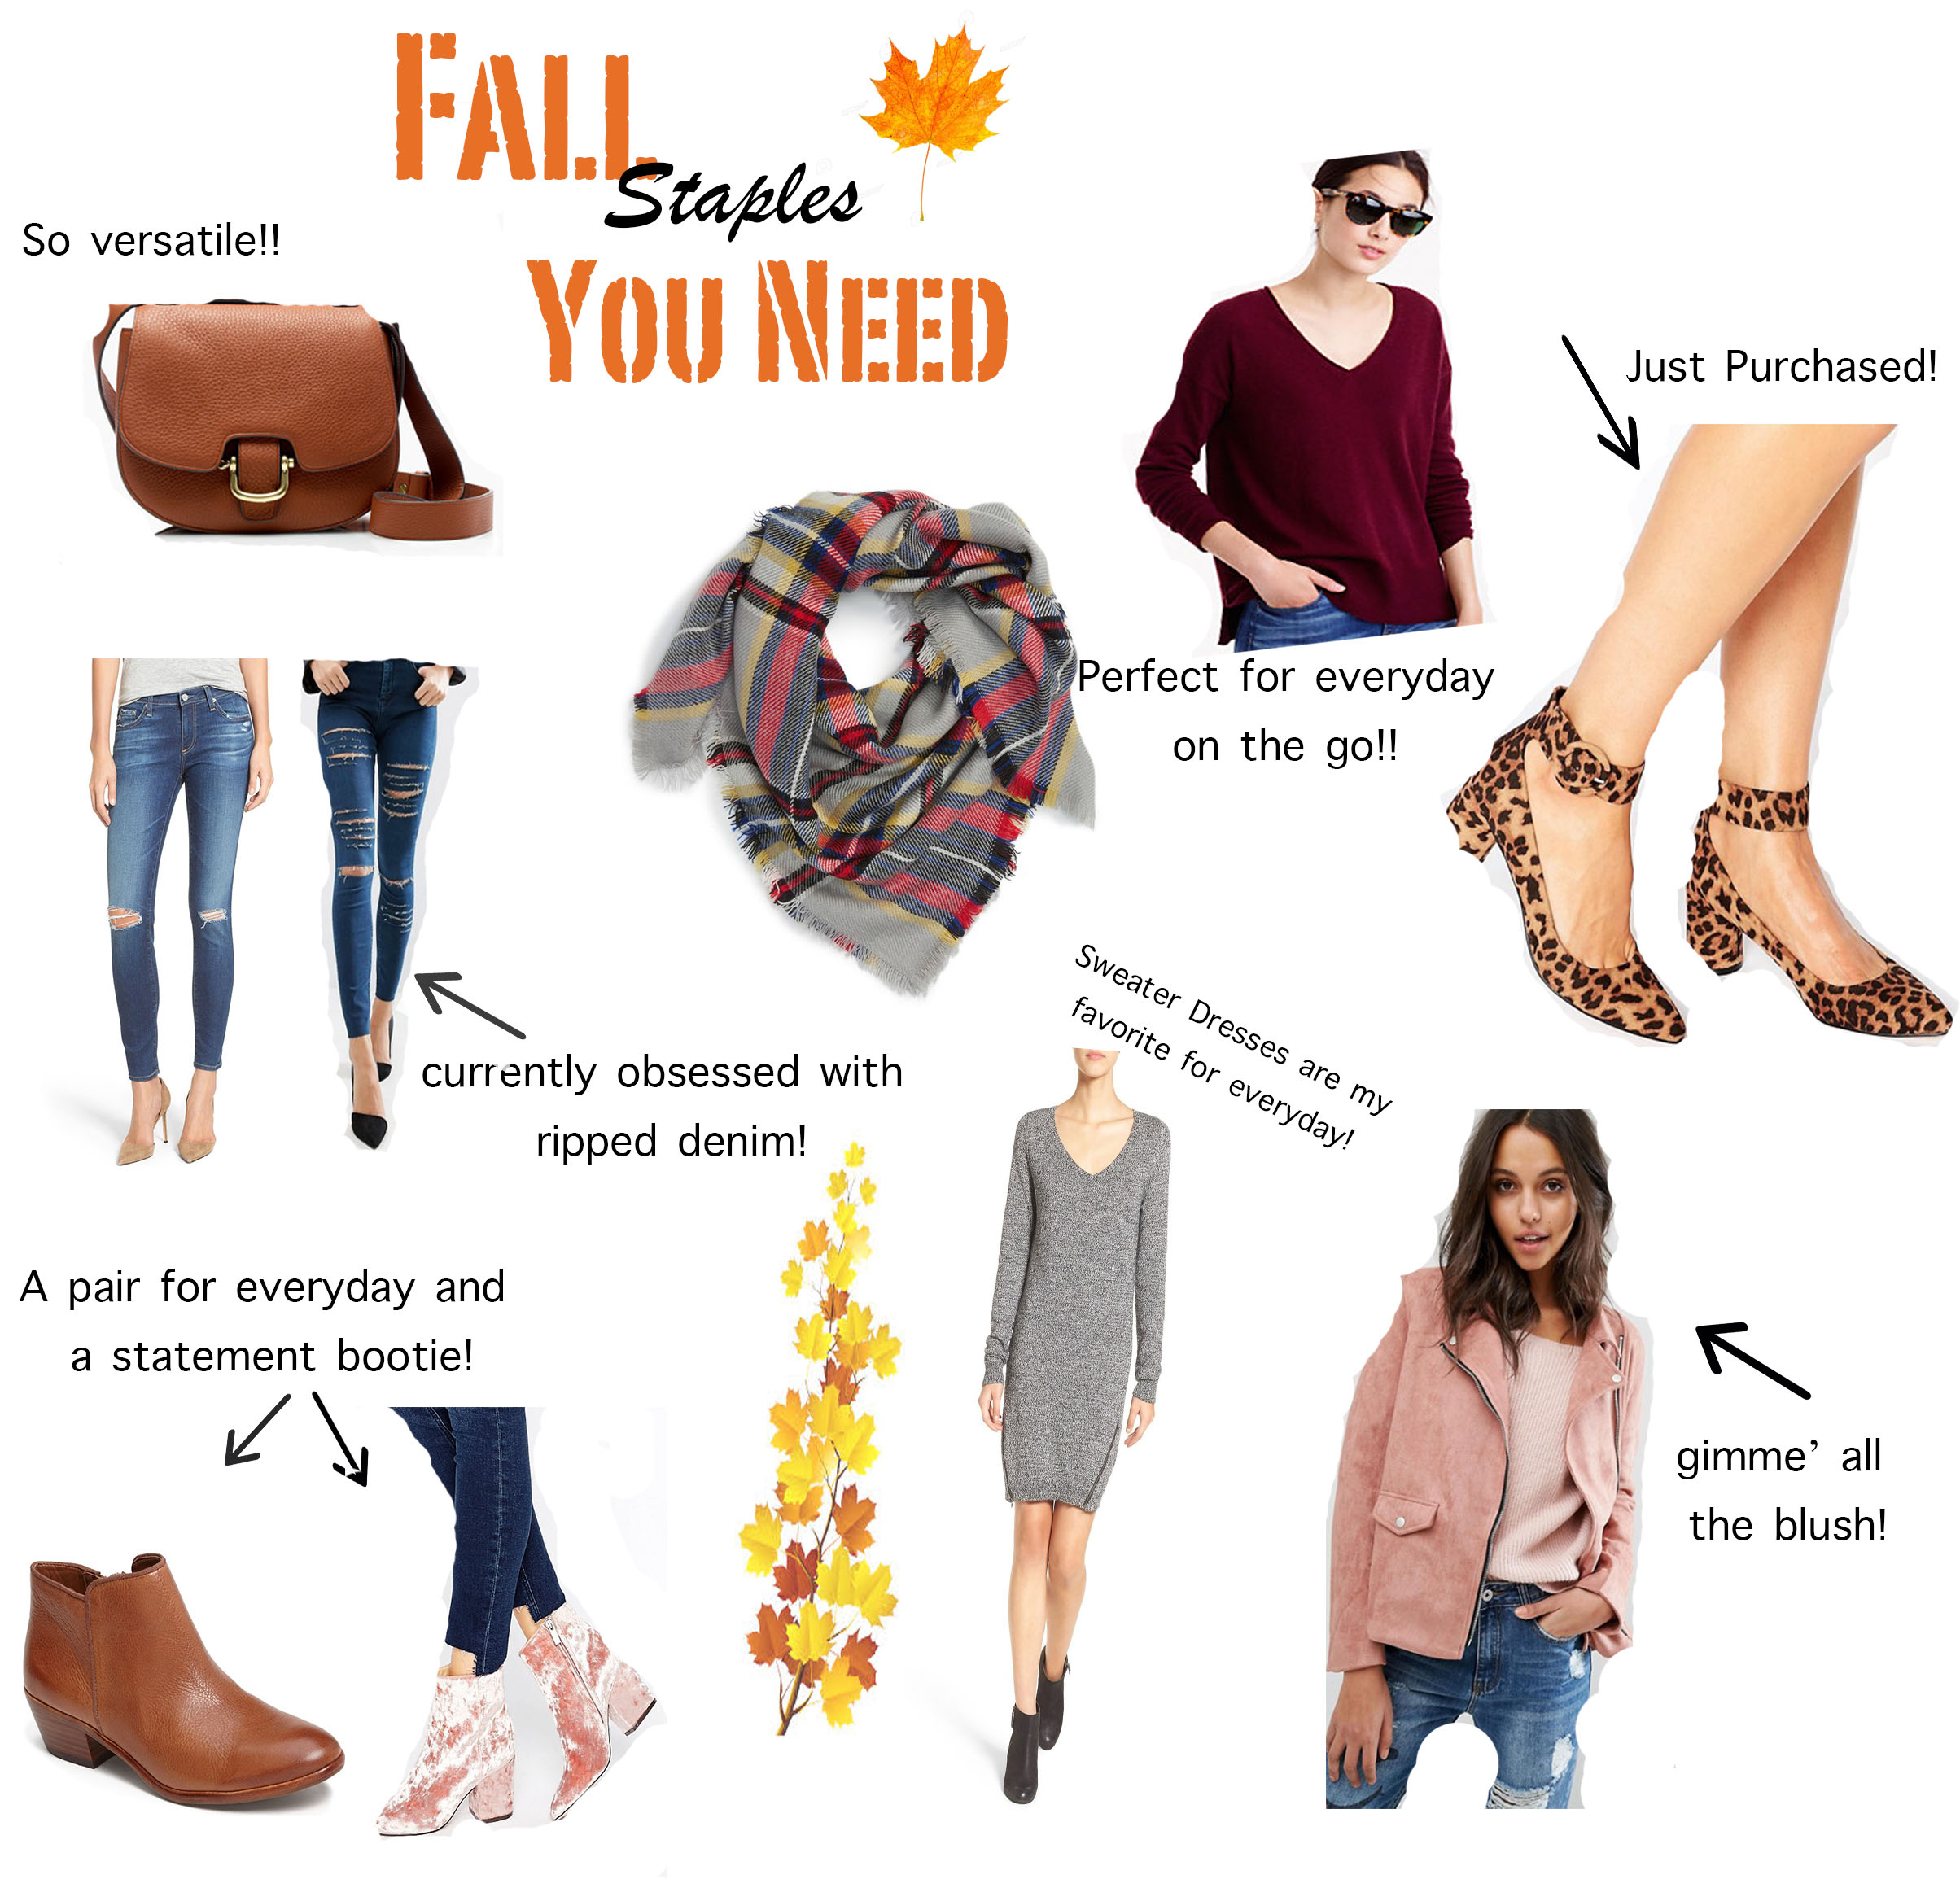 fall staples you NEED | AMS Blog